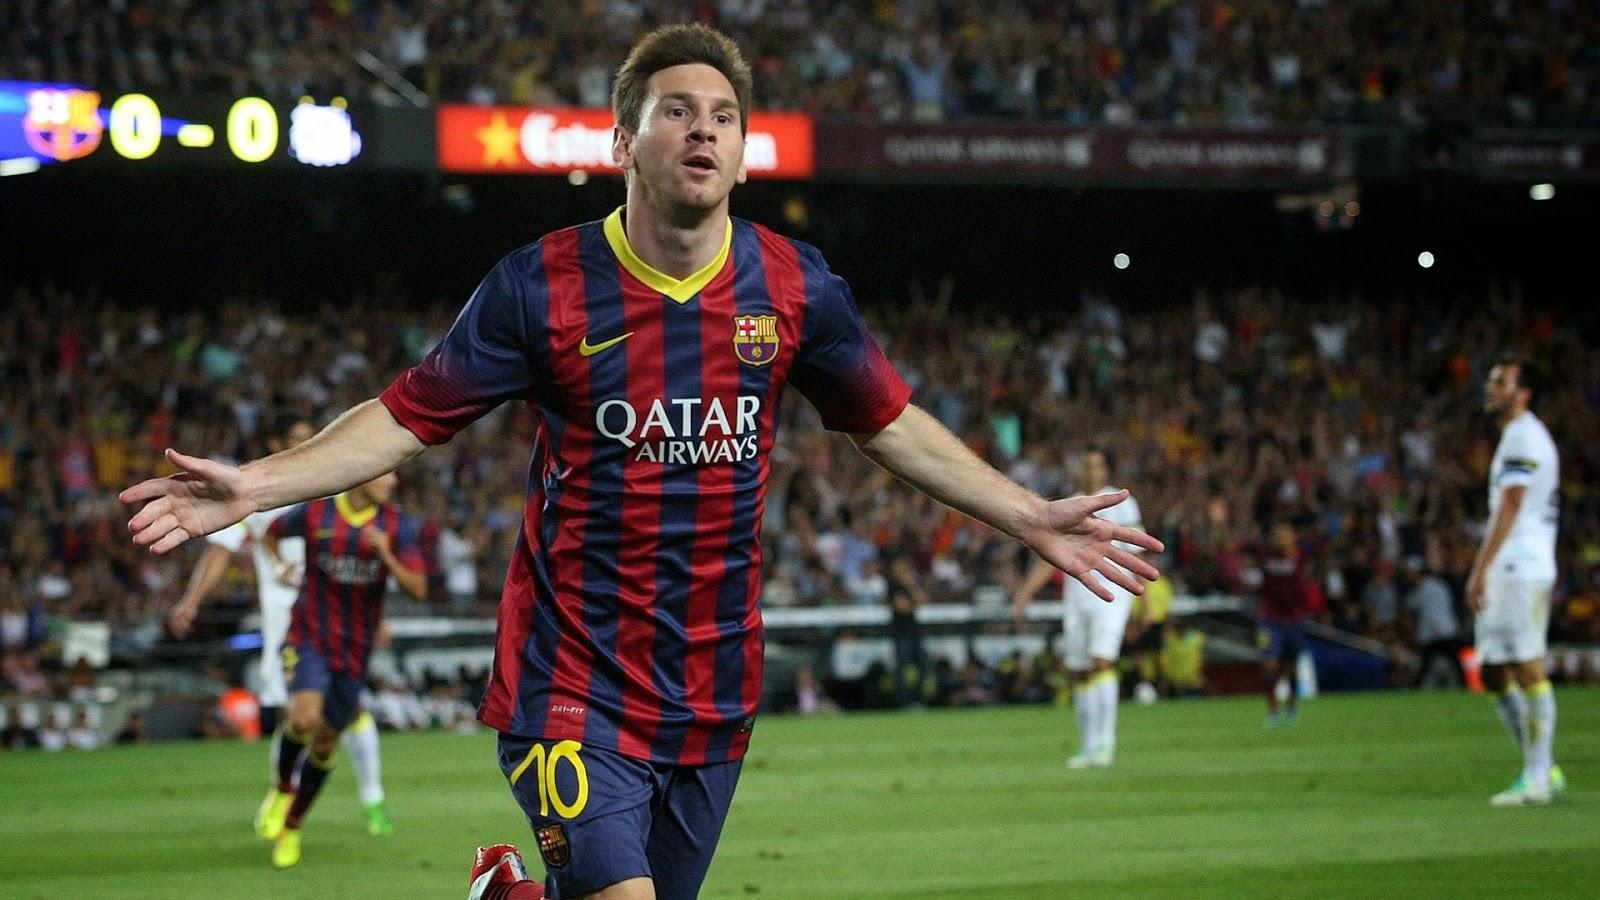 Lionel messi 20 alucinantes fondos de pantalla para tu for Fondos de pantalla de futbol para celular